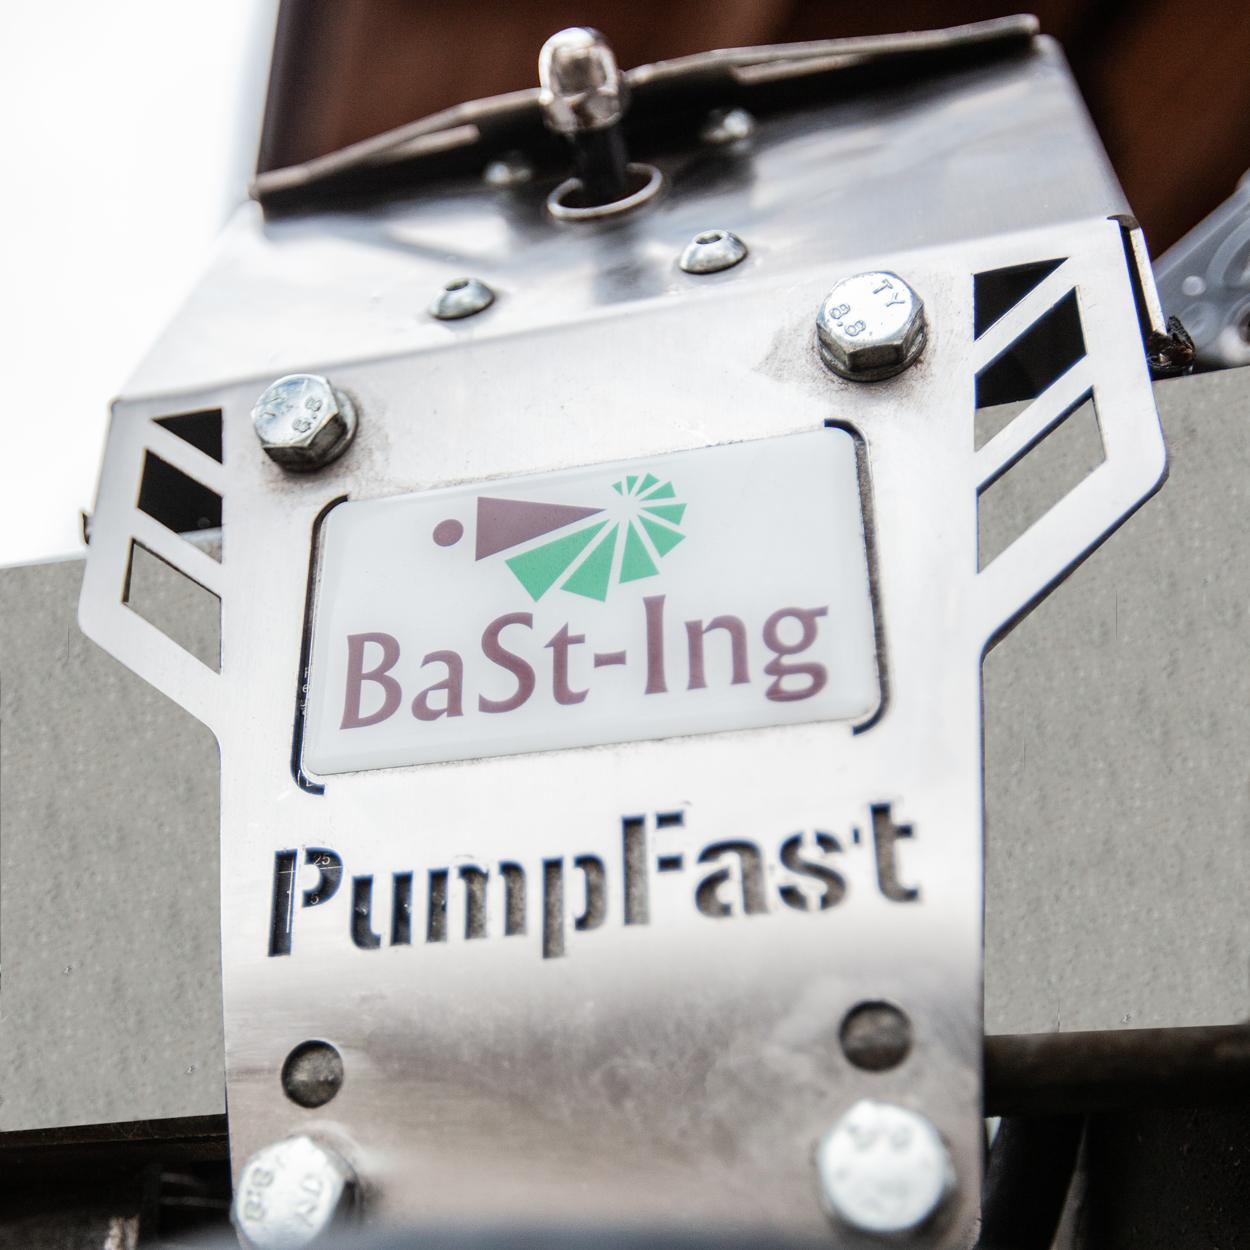 bast-ing-pumpfast-ac